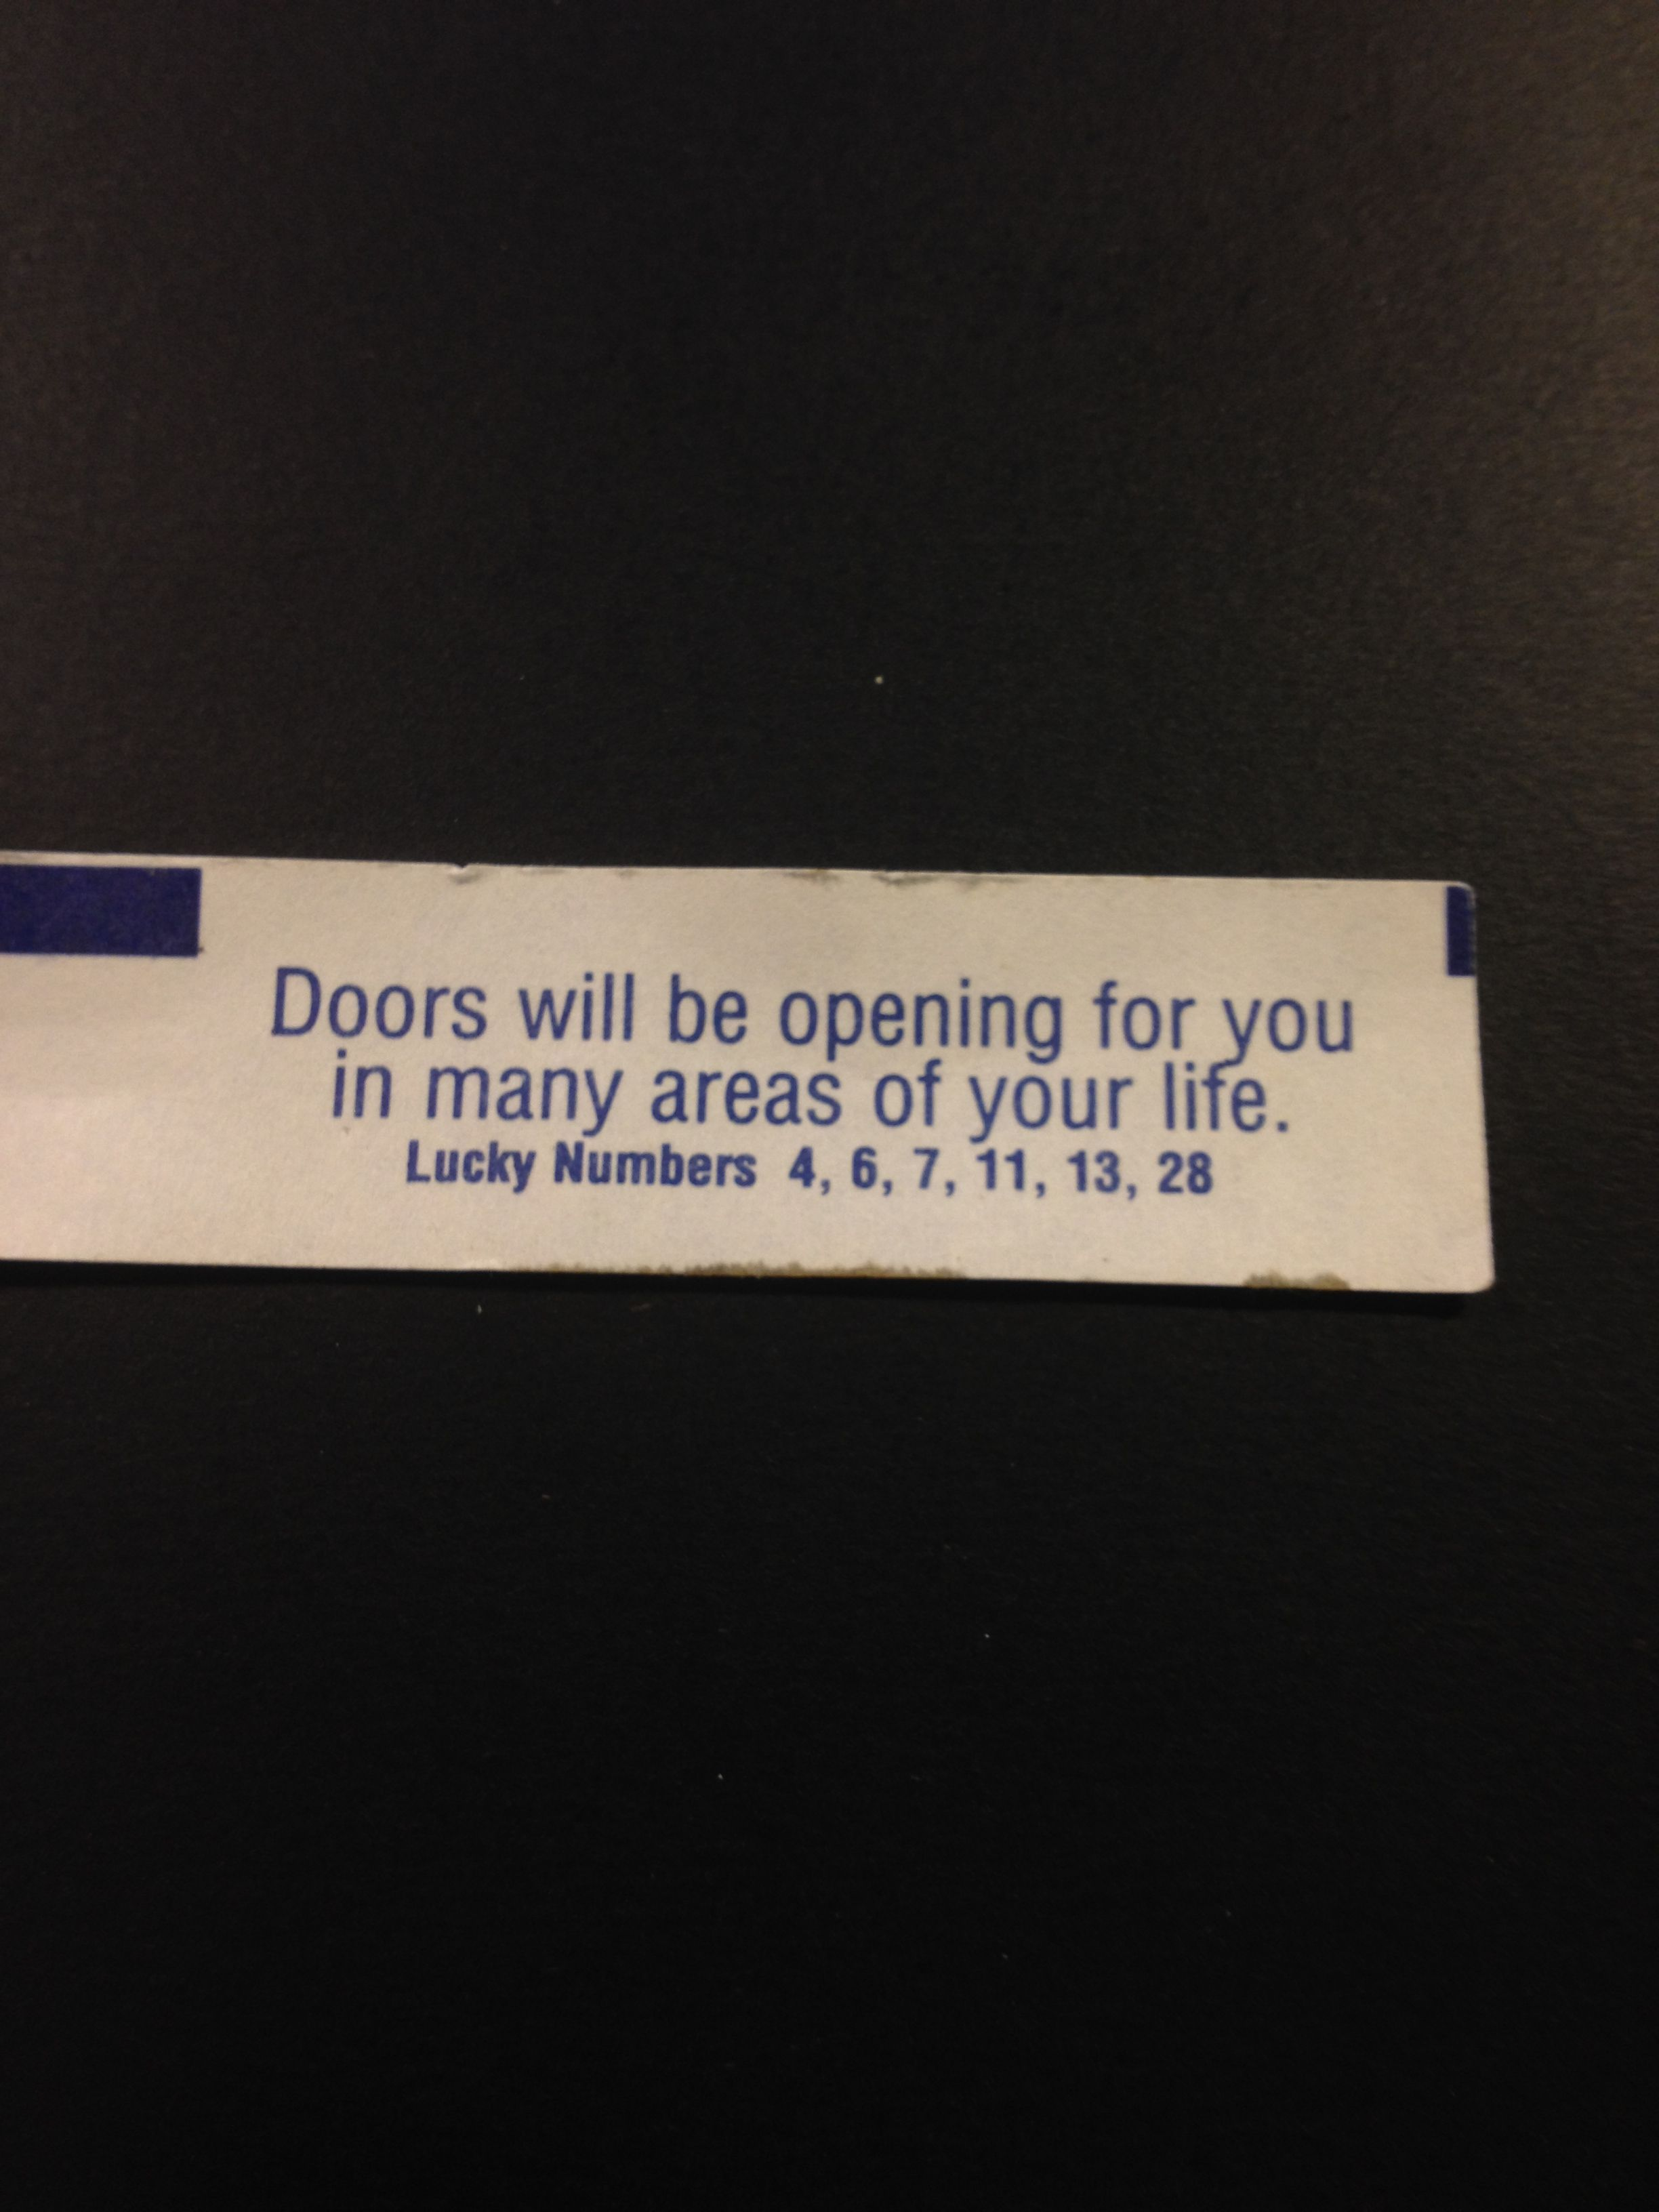 Pin by Keelie Grewiq on fortune cookie sayings Cookie